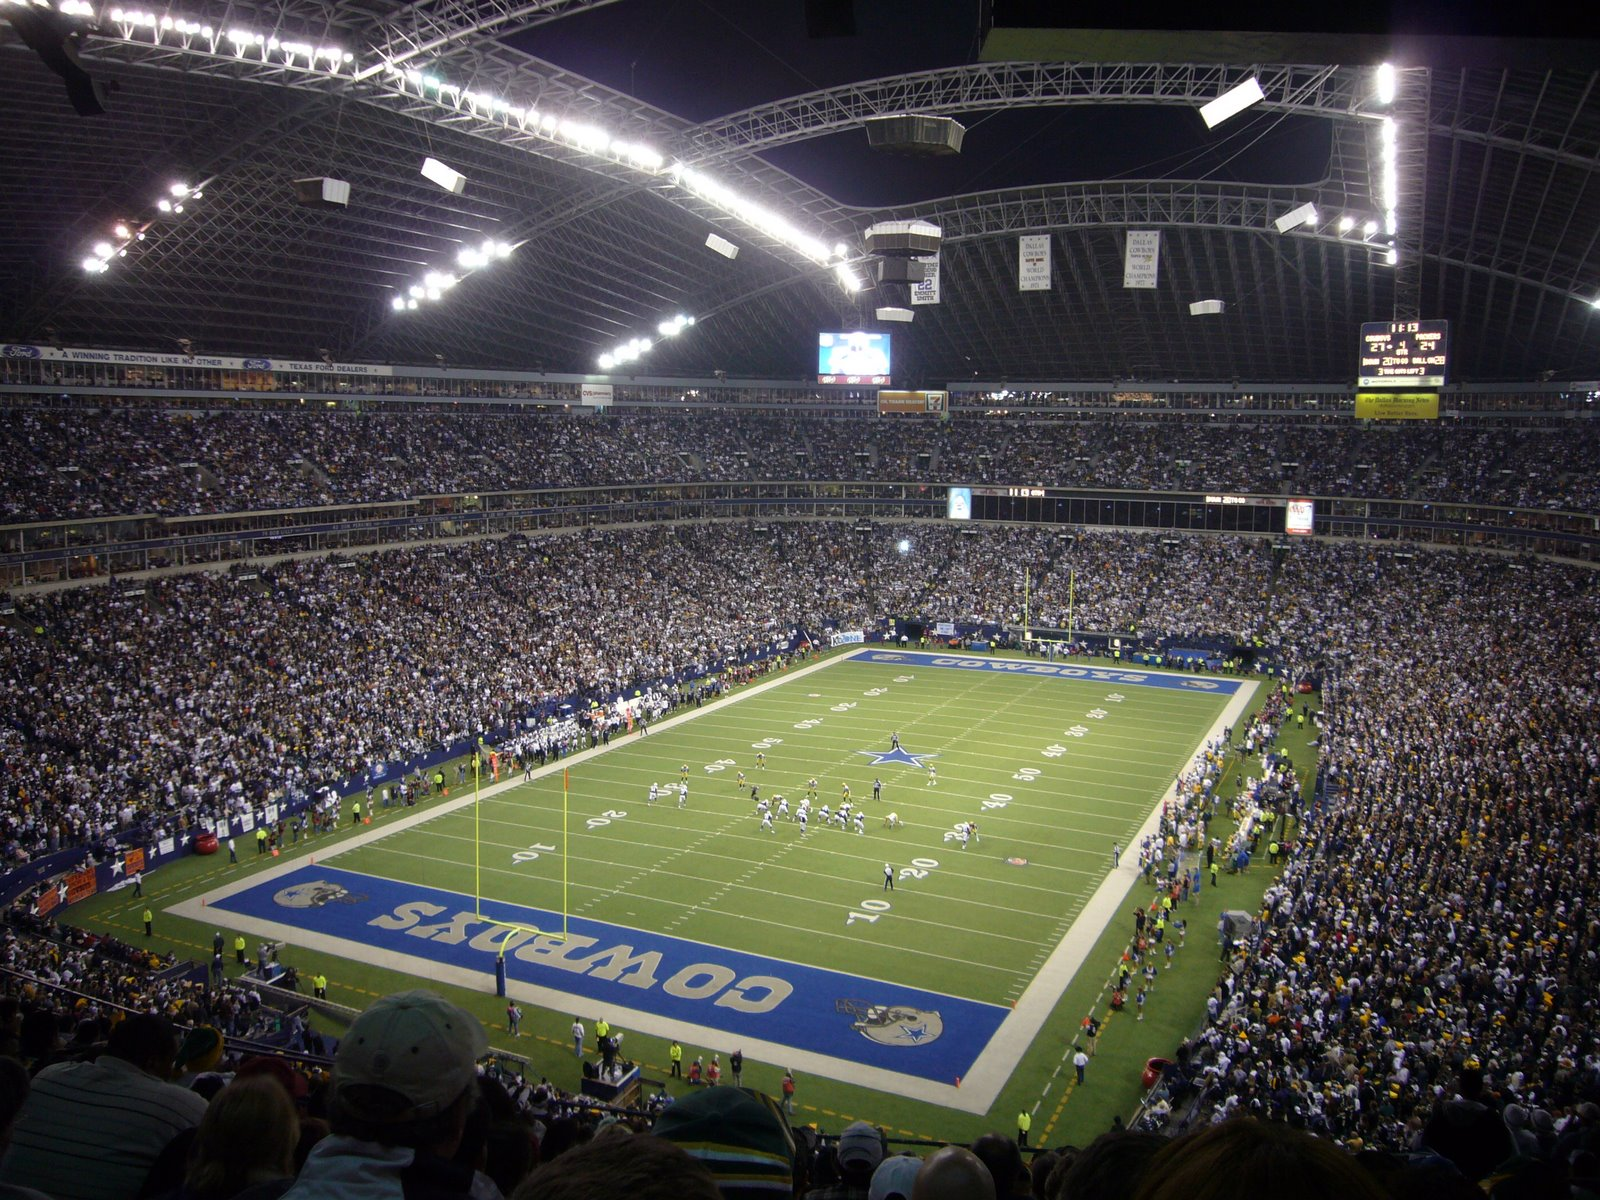 Enjoy this Dallas Cowboys background Dallas Cowboys wallpapers 1600x1200